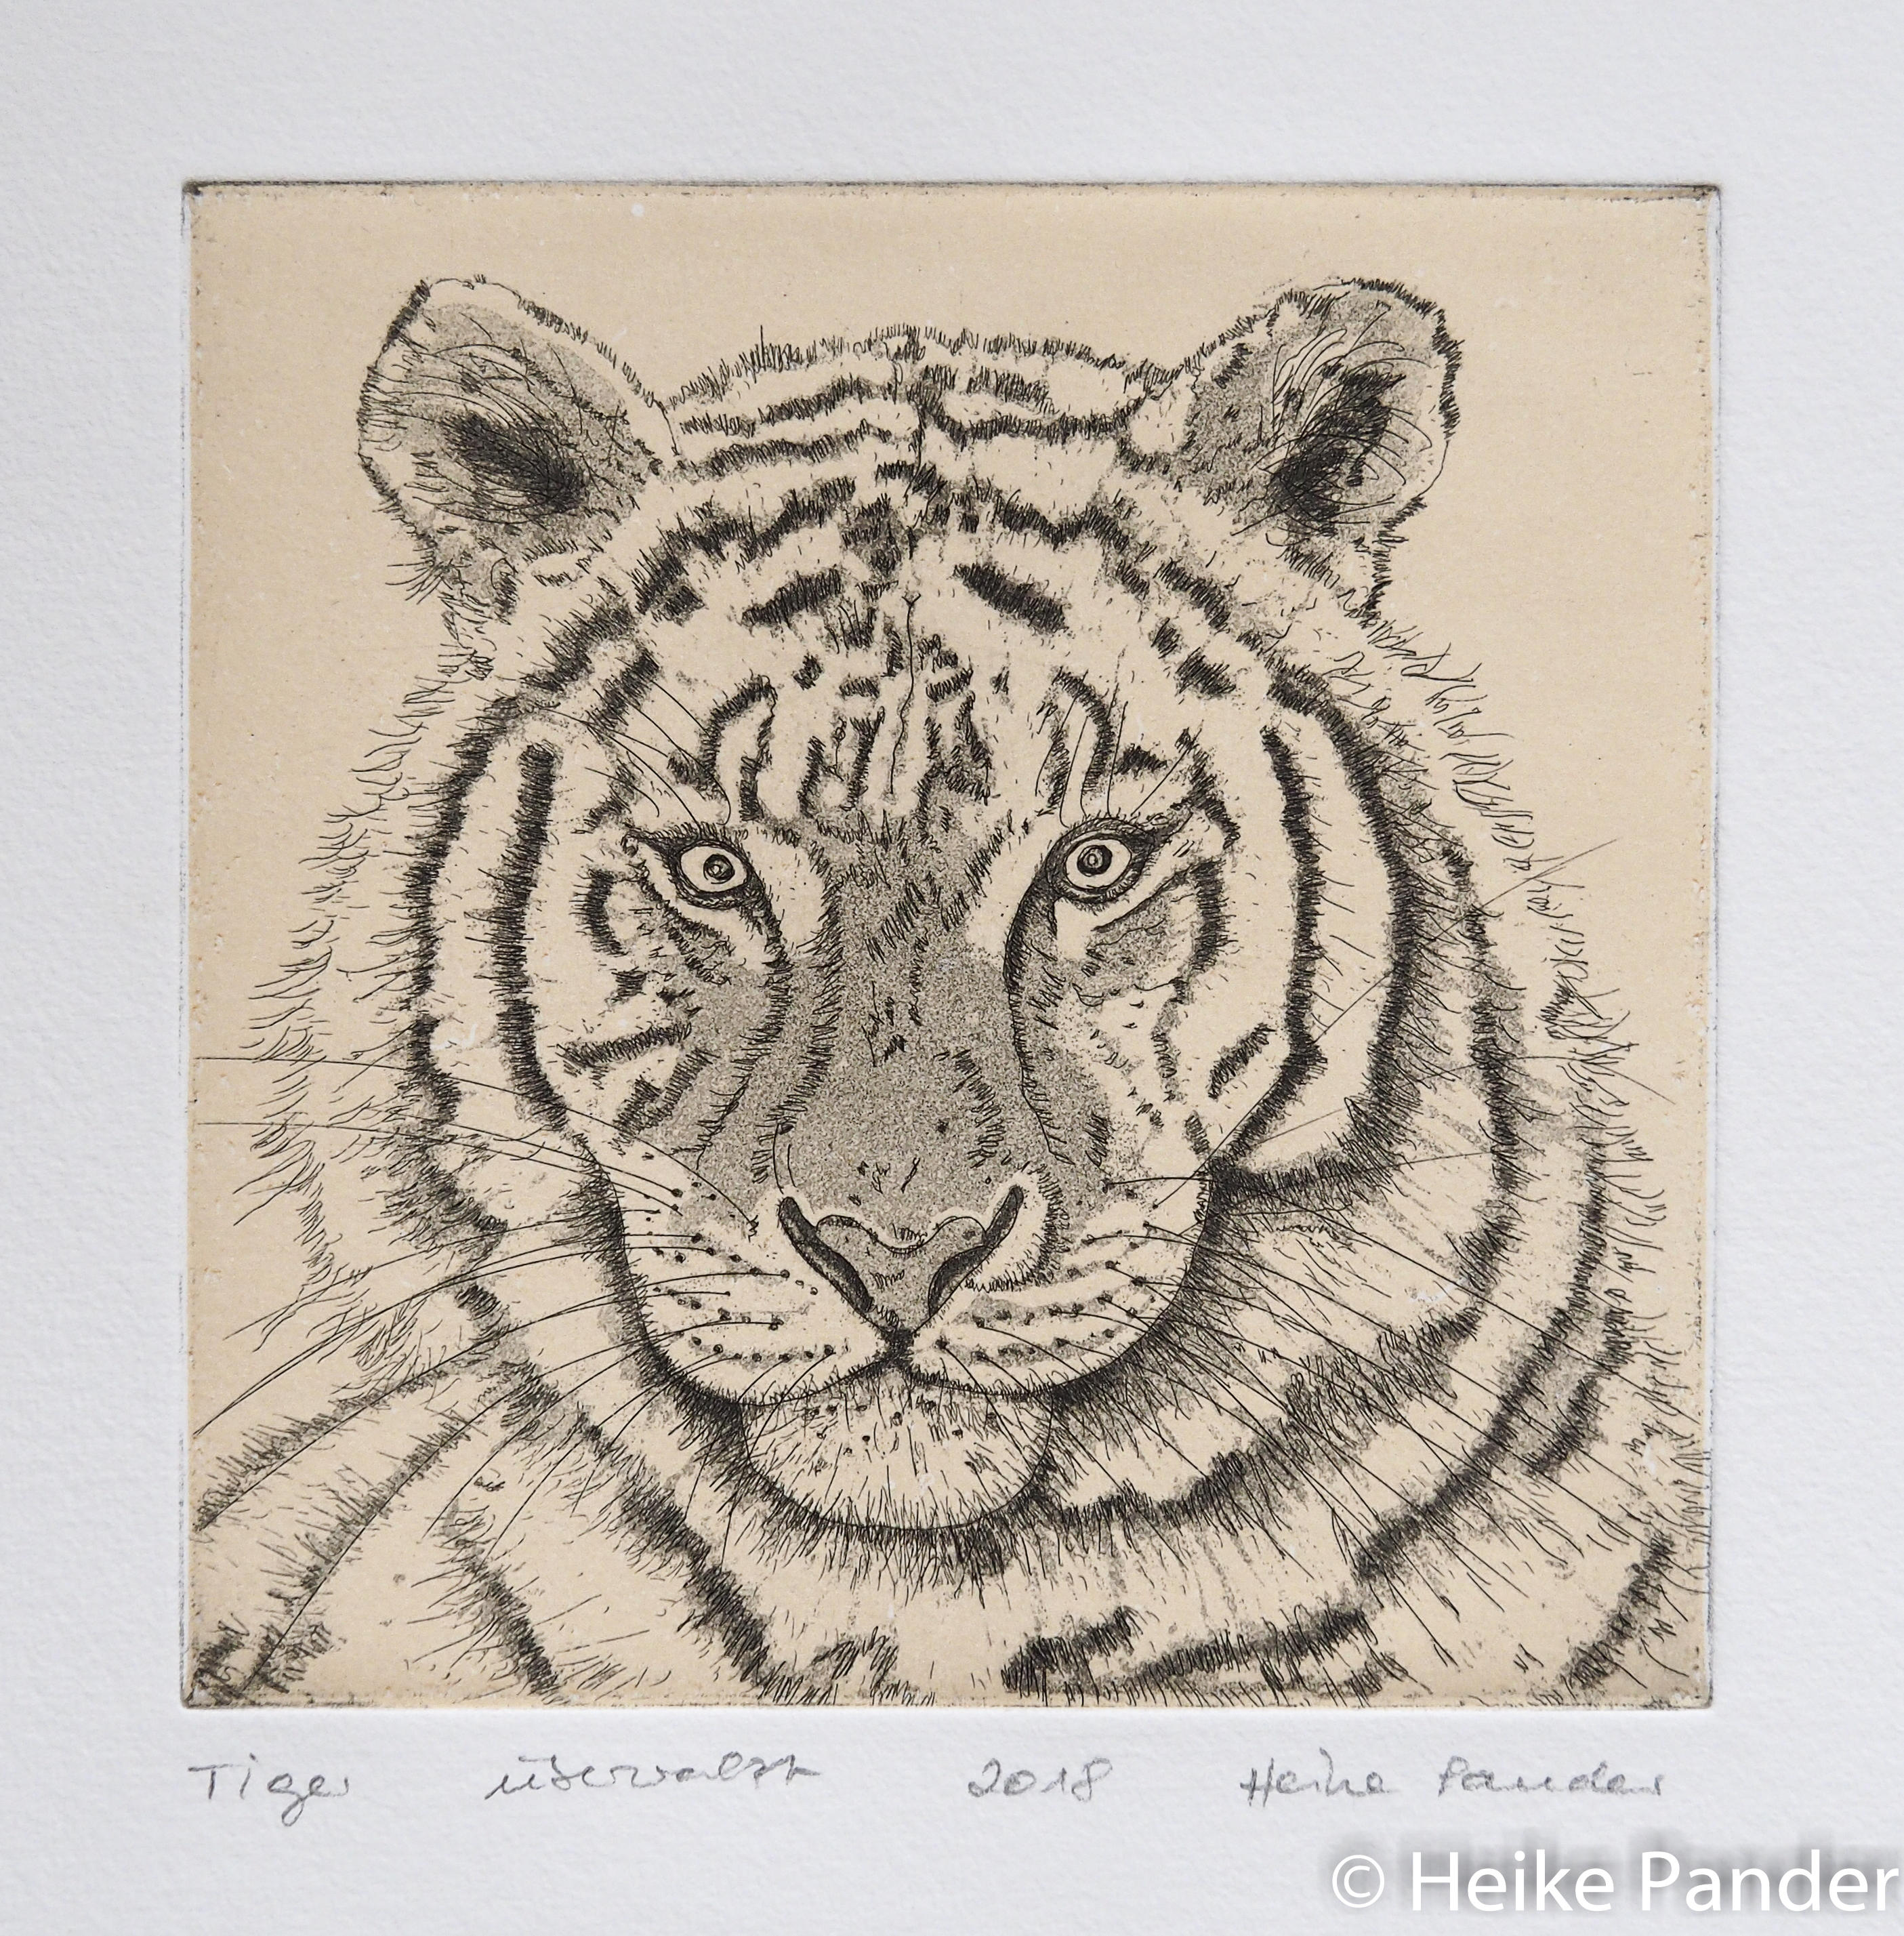 Tiger, Aquatinta, Strichätzung, Heike Pander